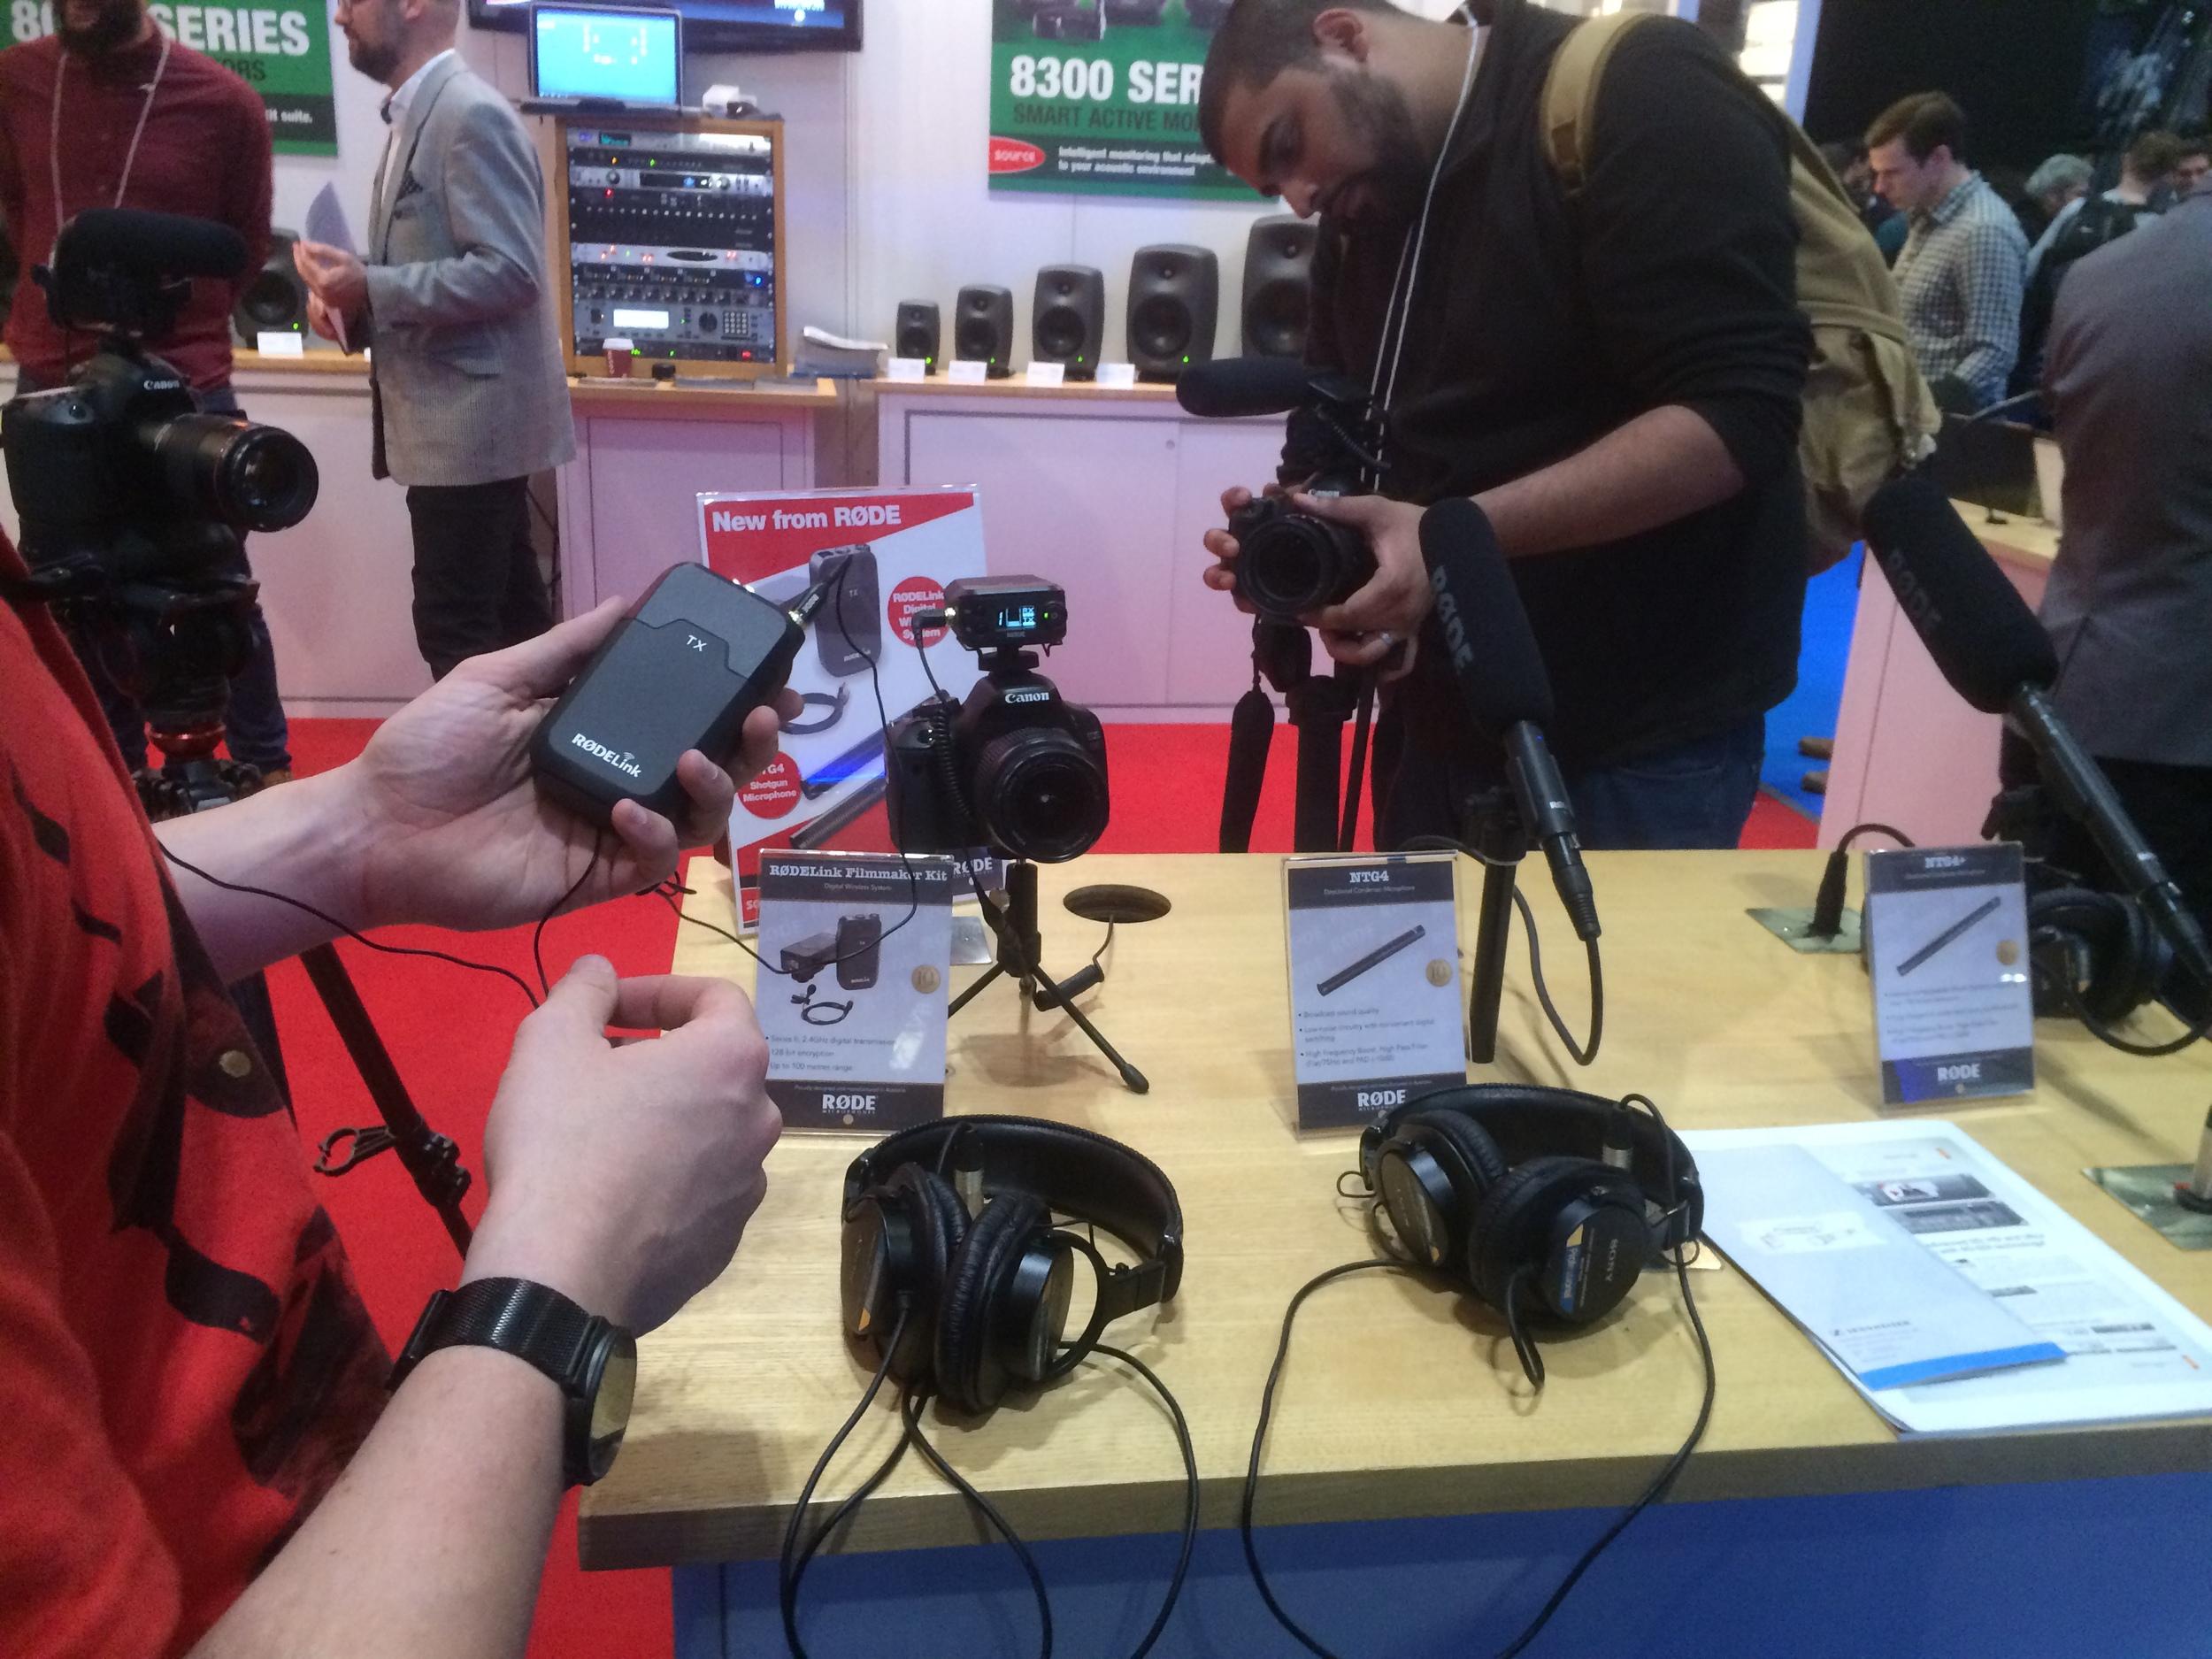 The NEW Rode Filmmaker wireless audio kit